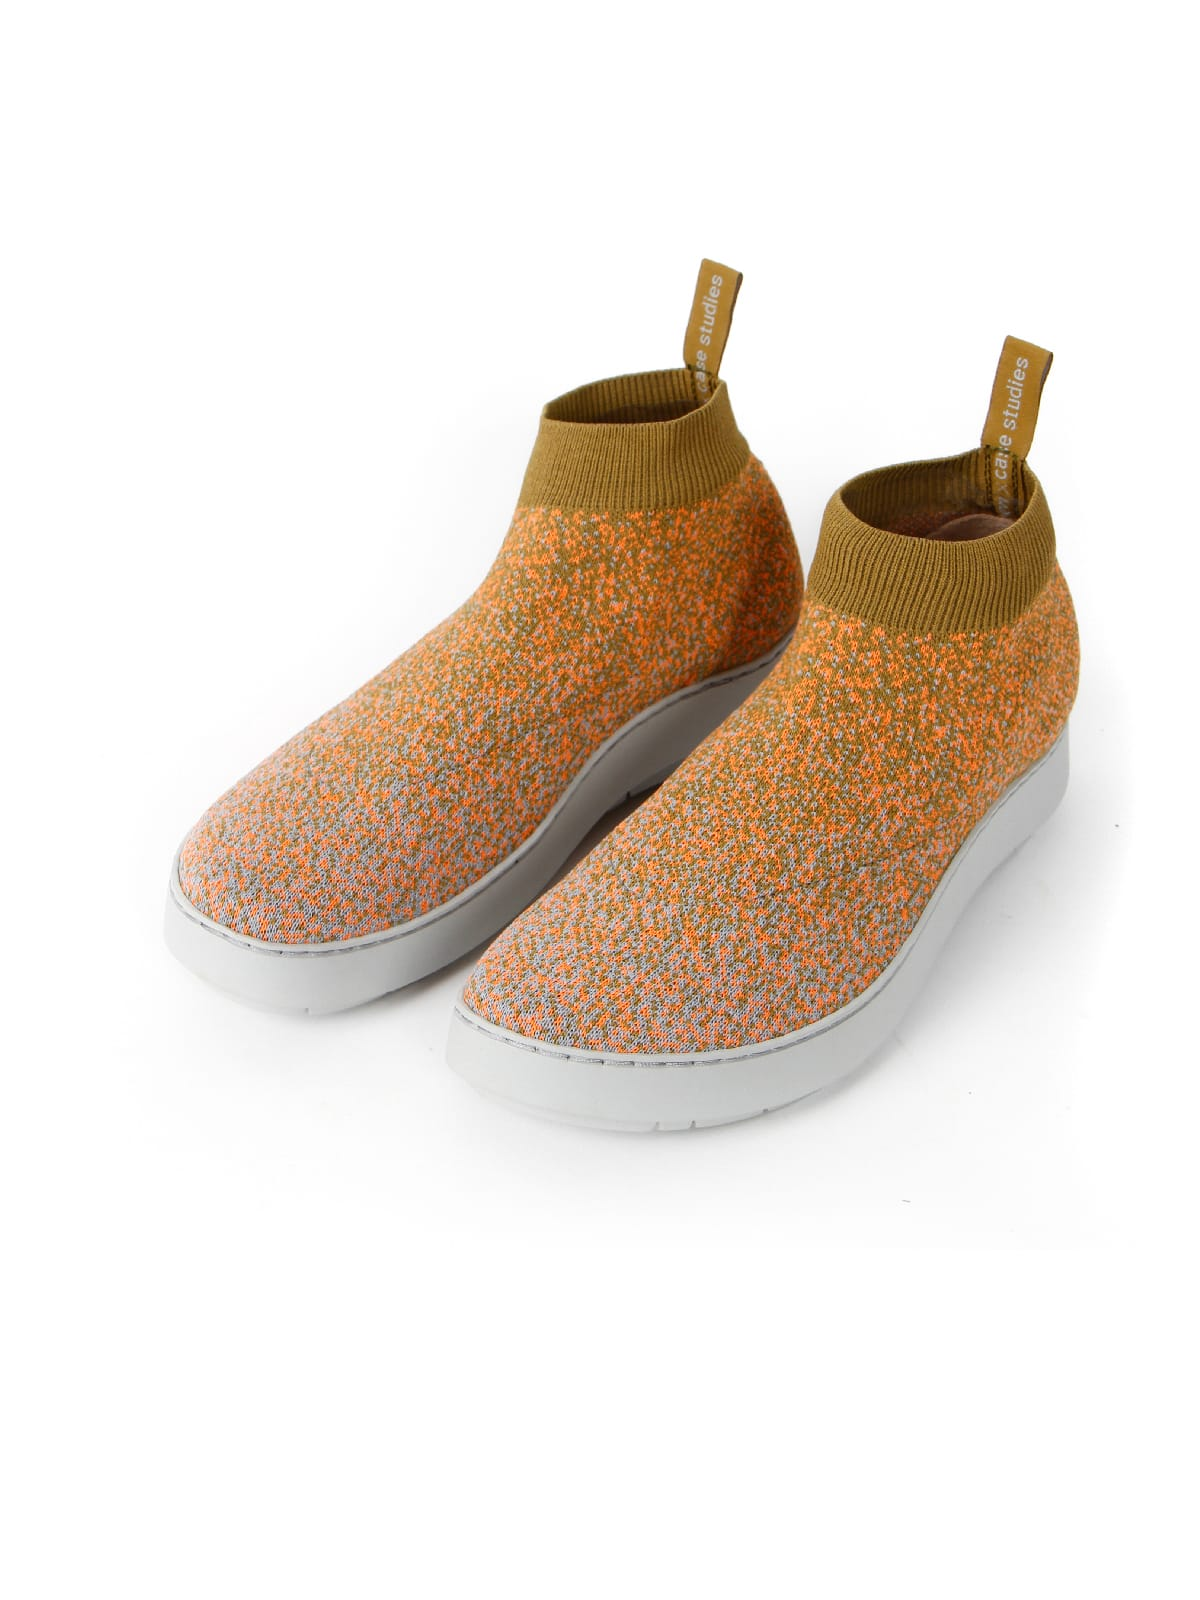 3D knitted sockboot Spexx papaya schräg